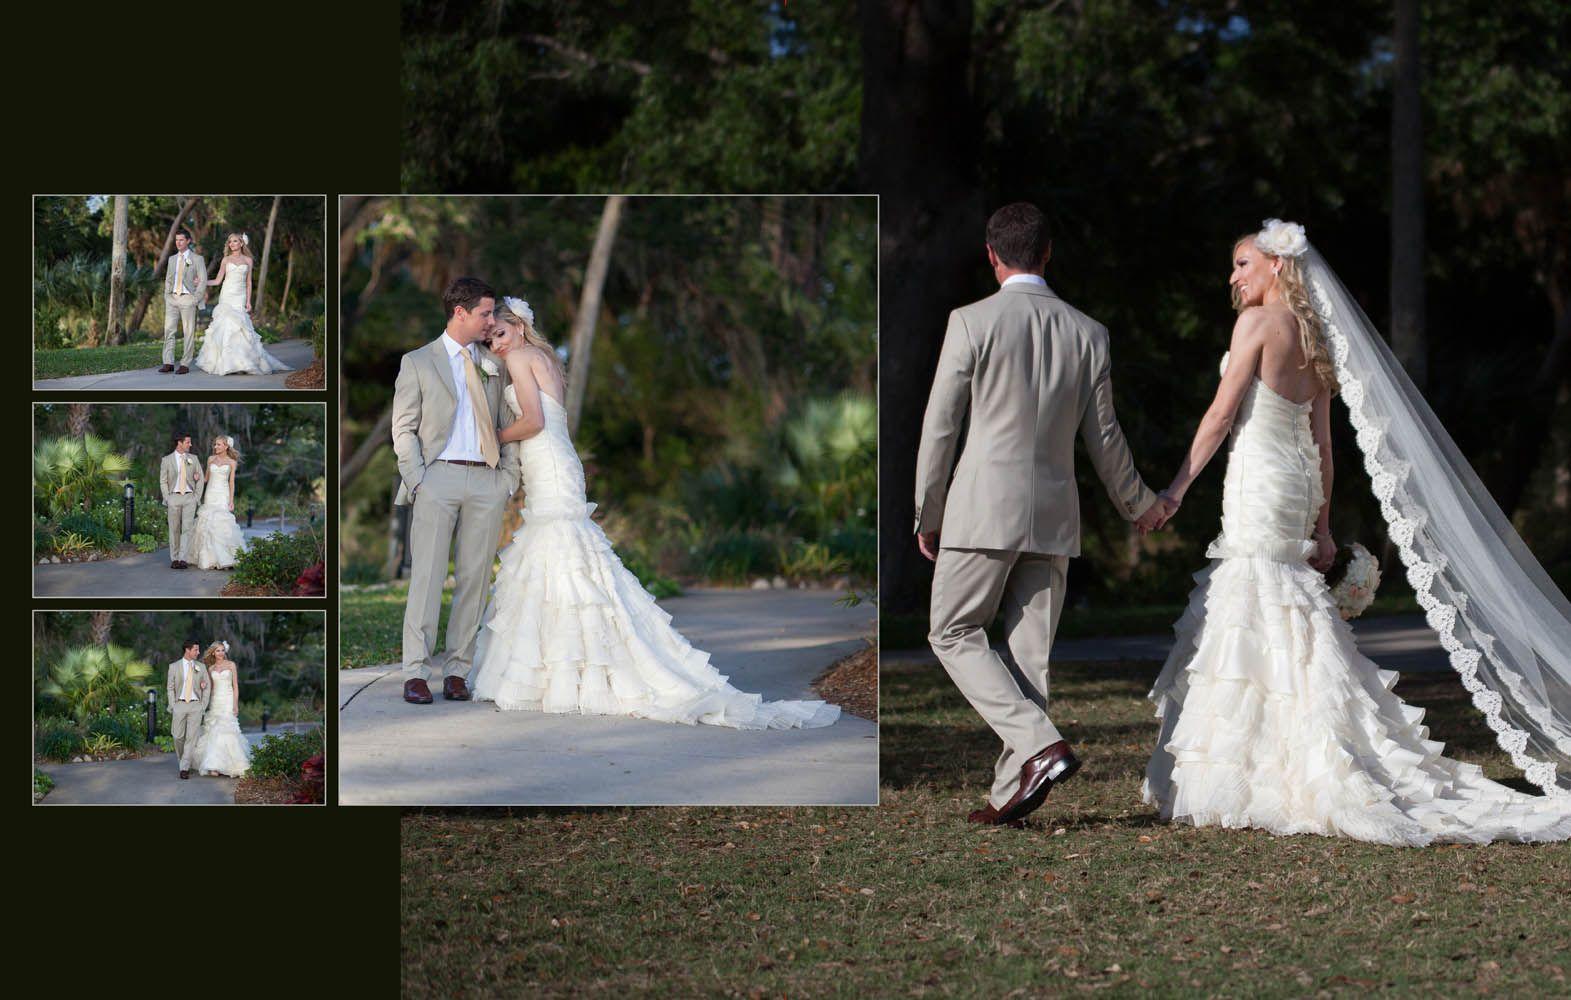 http://www.albumsremembered.com/design-gallery/weddings Free ...